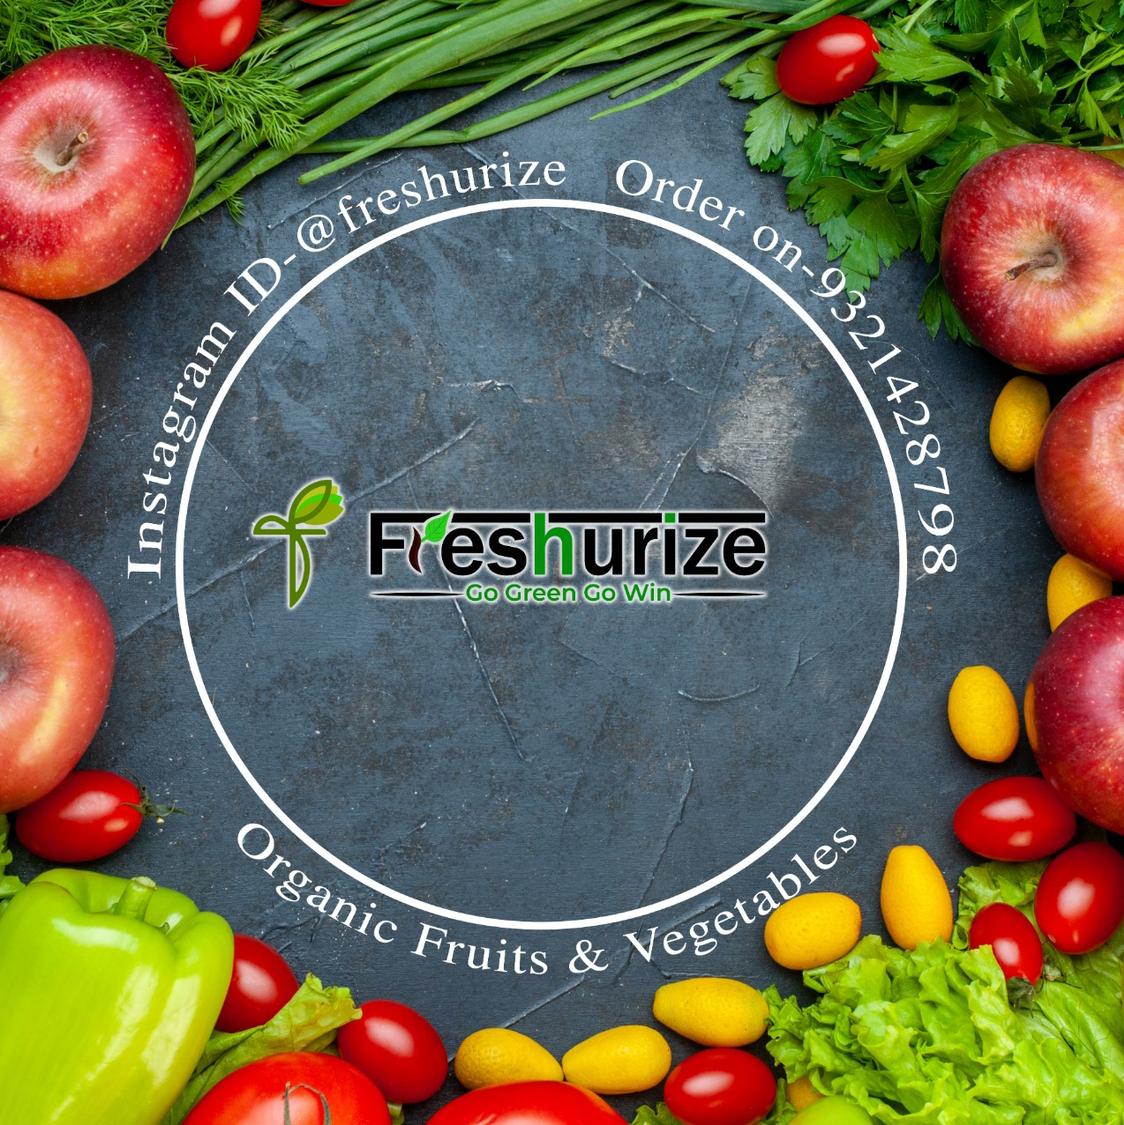 Freshurize